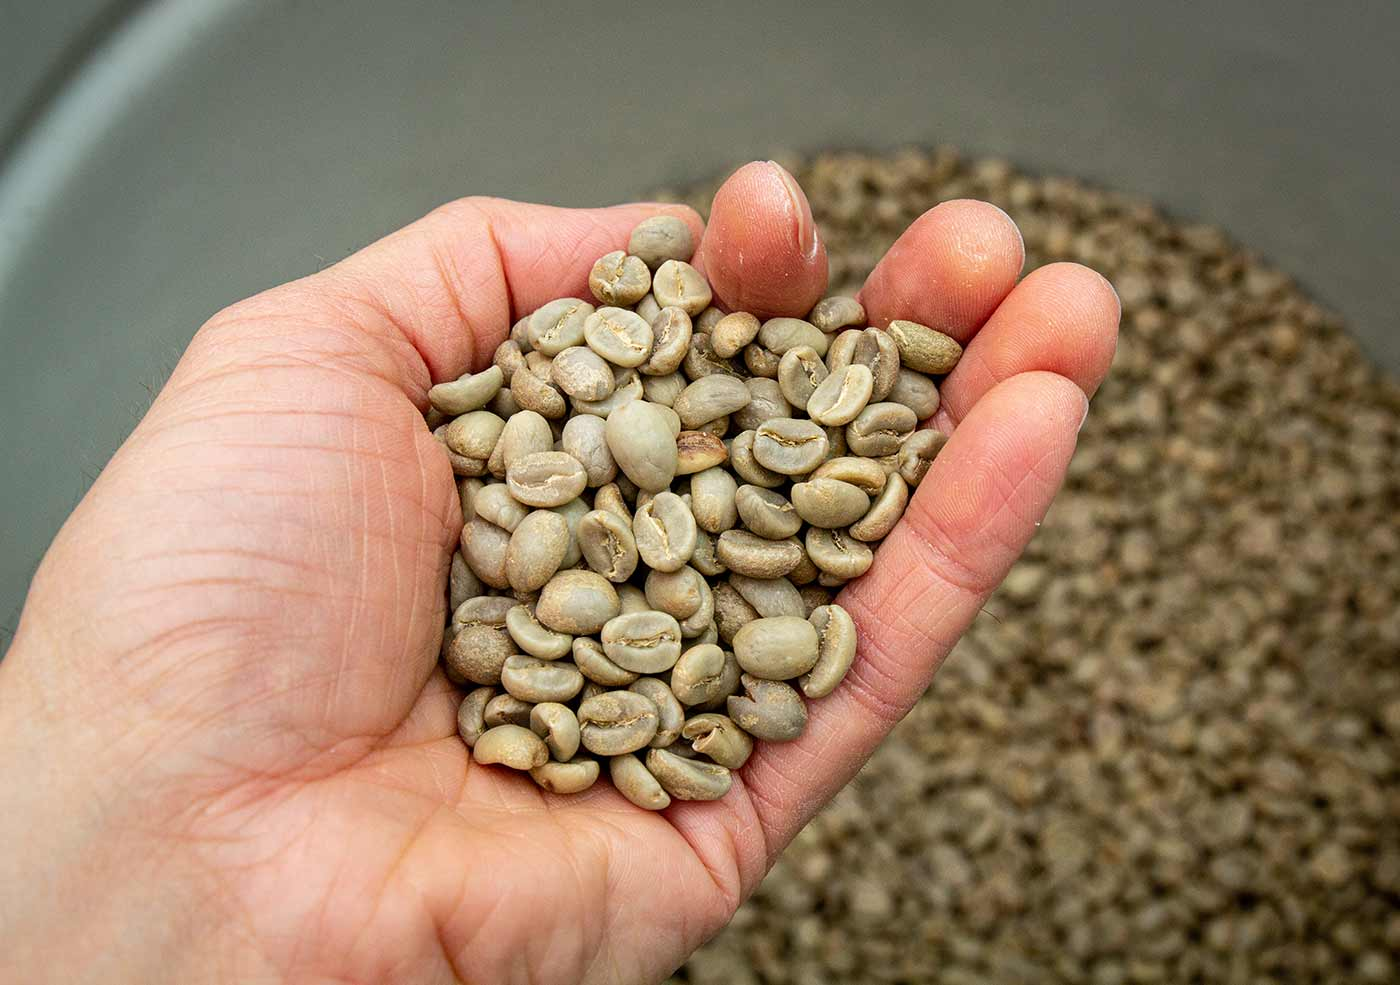 Frischer, grüner Kaffee vor dem Rösten